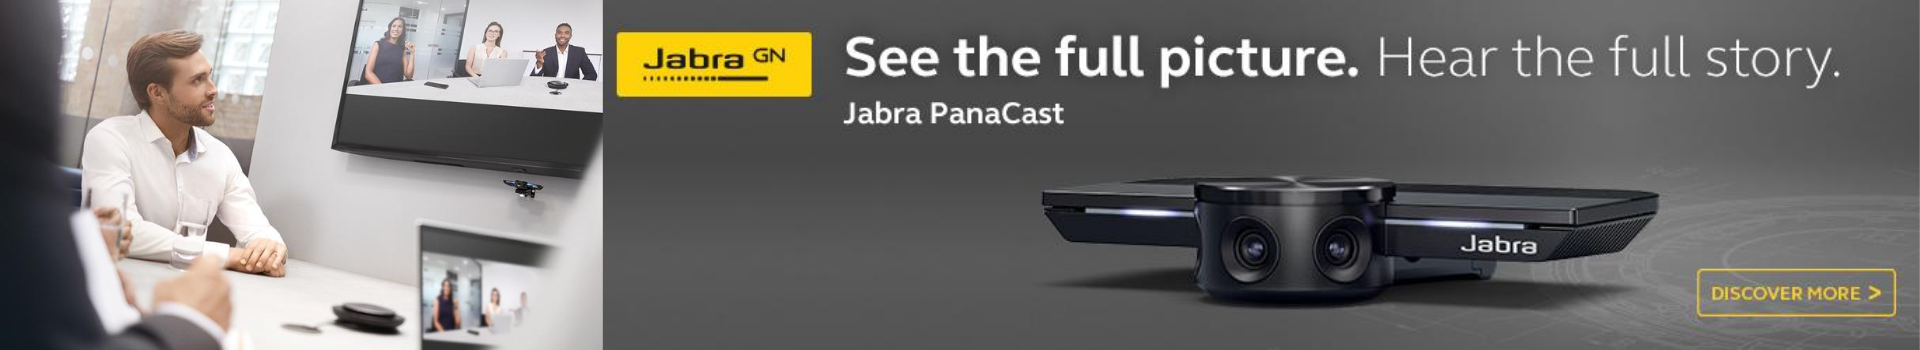 Jabra-Panacast